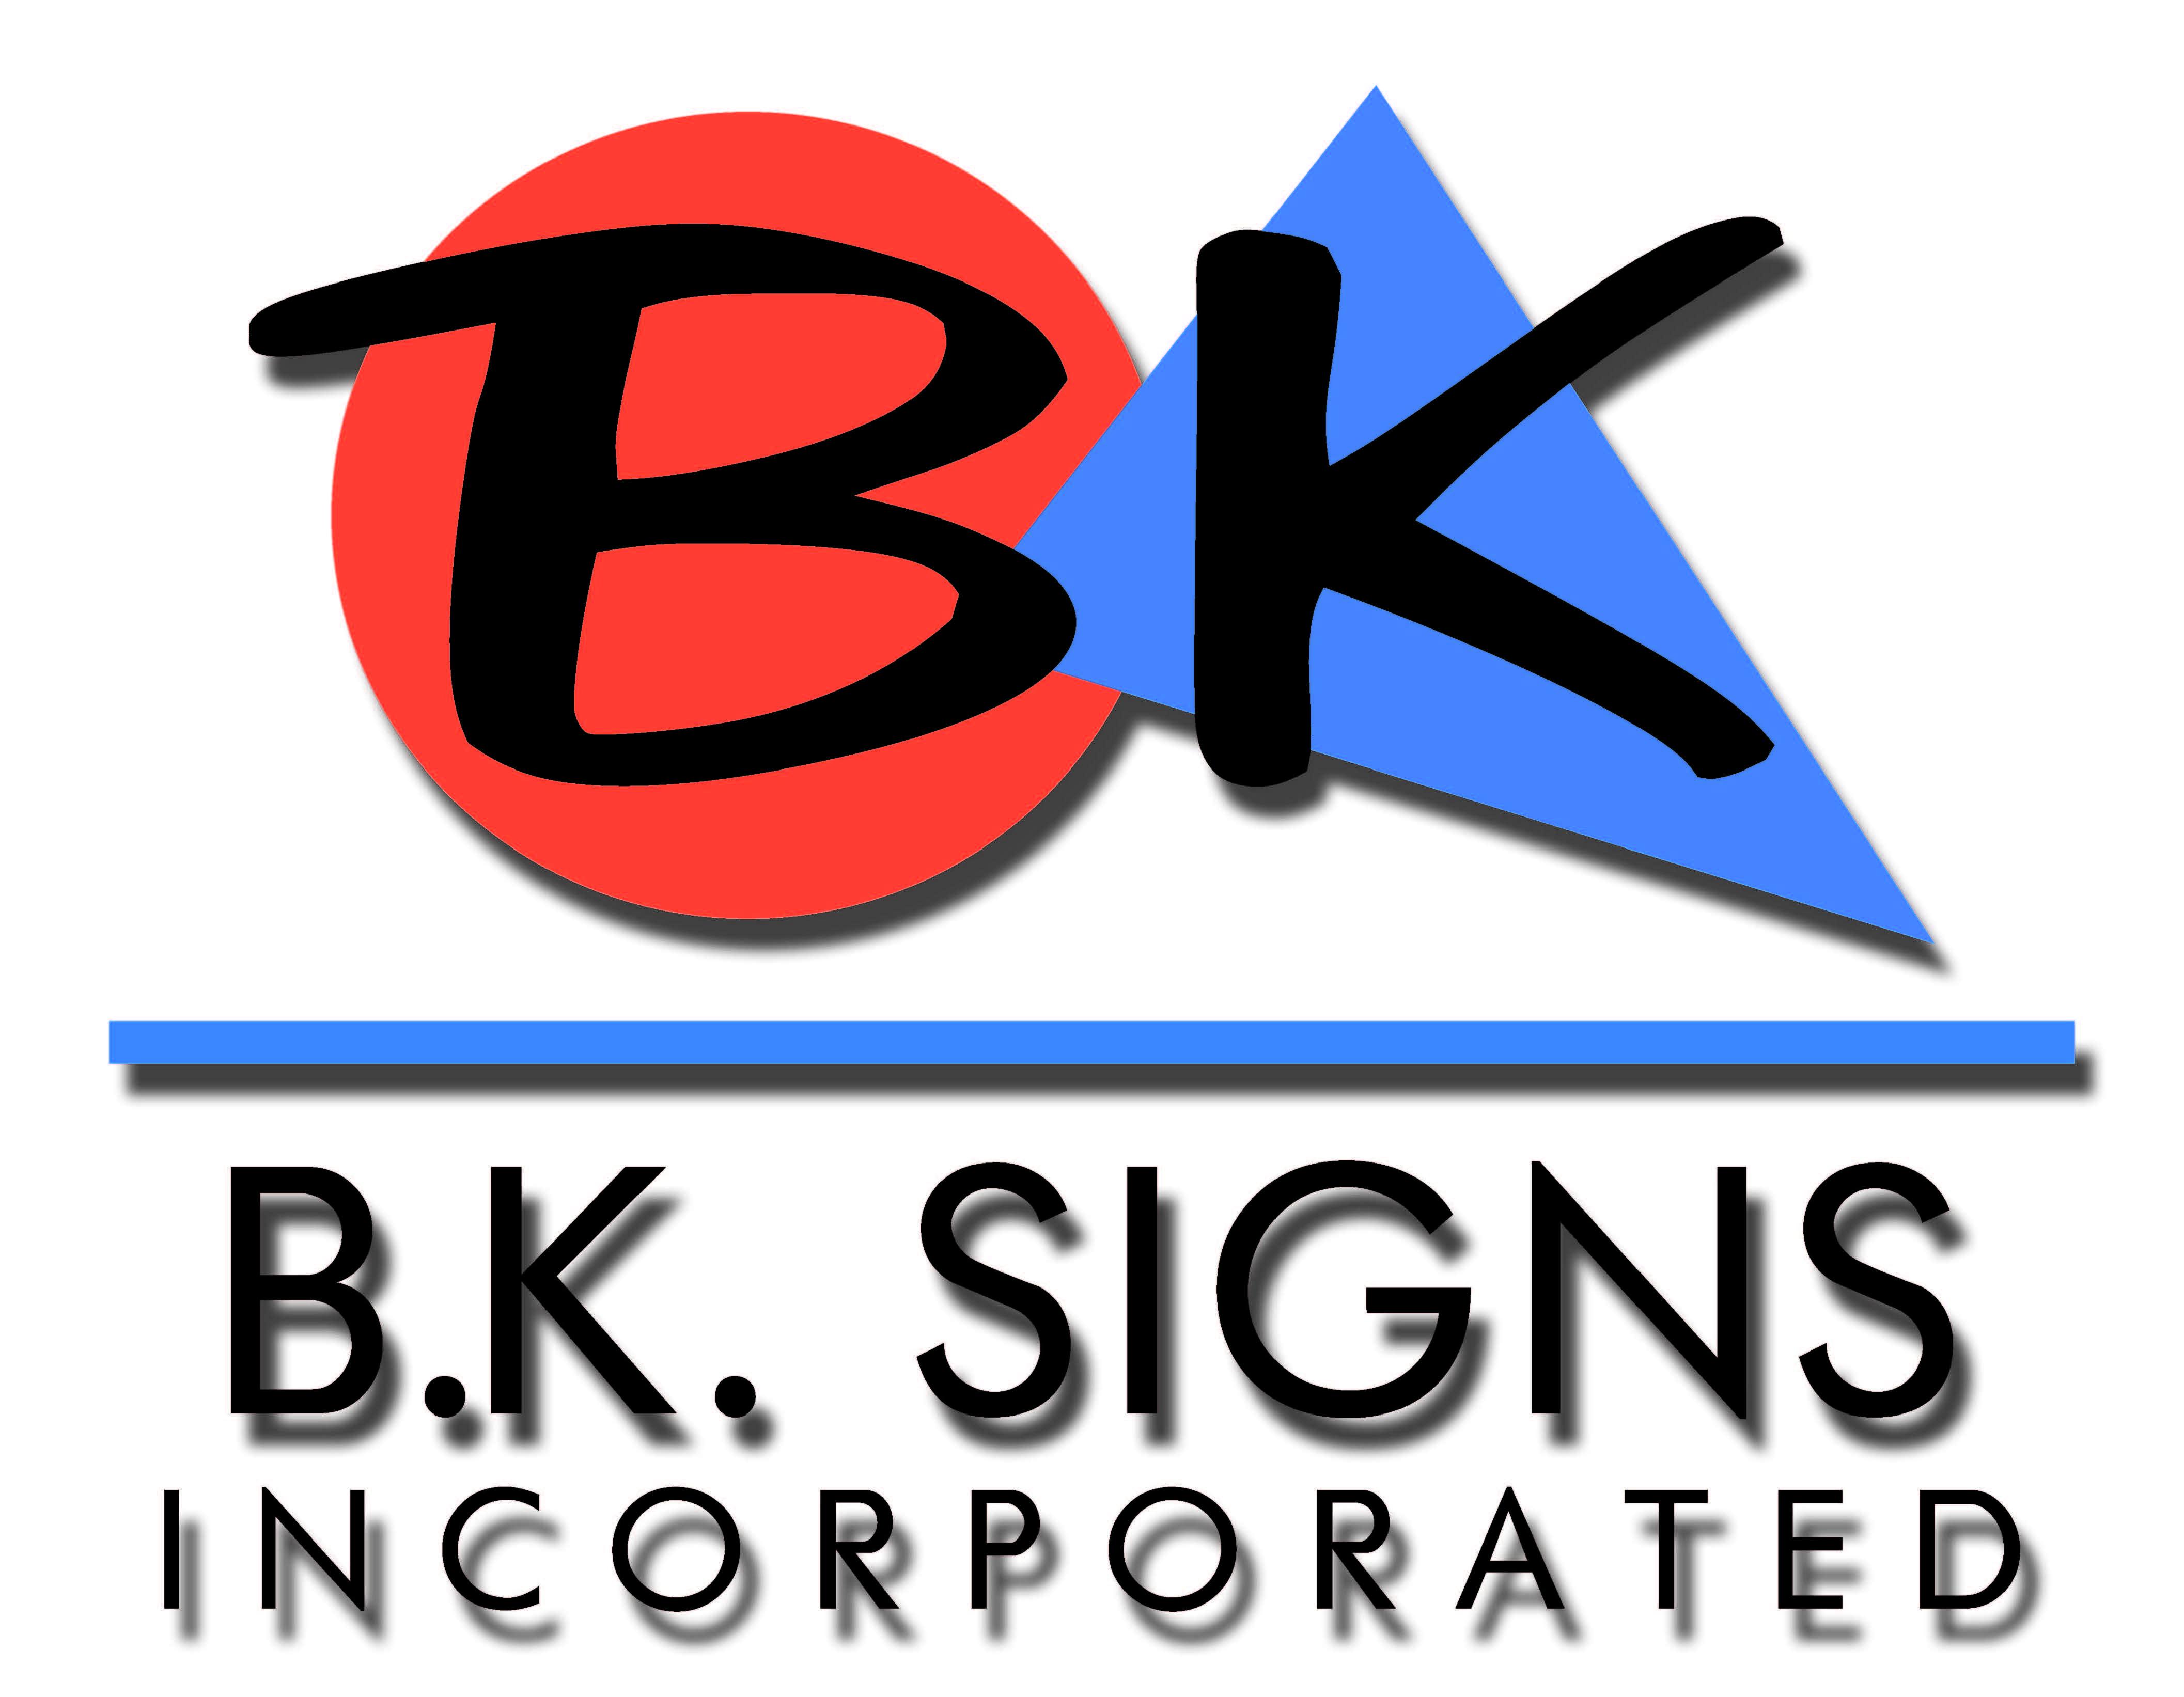 B.K. Signs, Inc